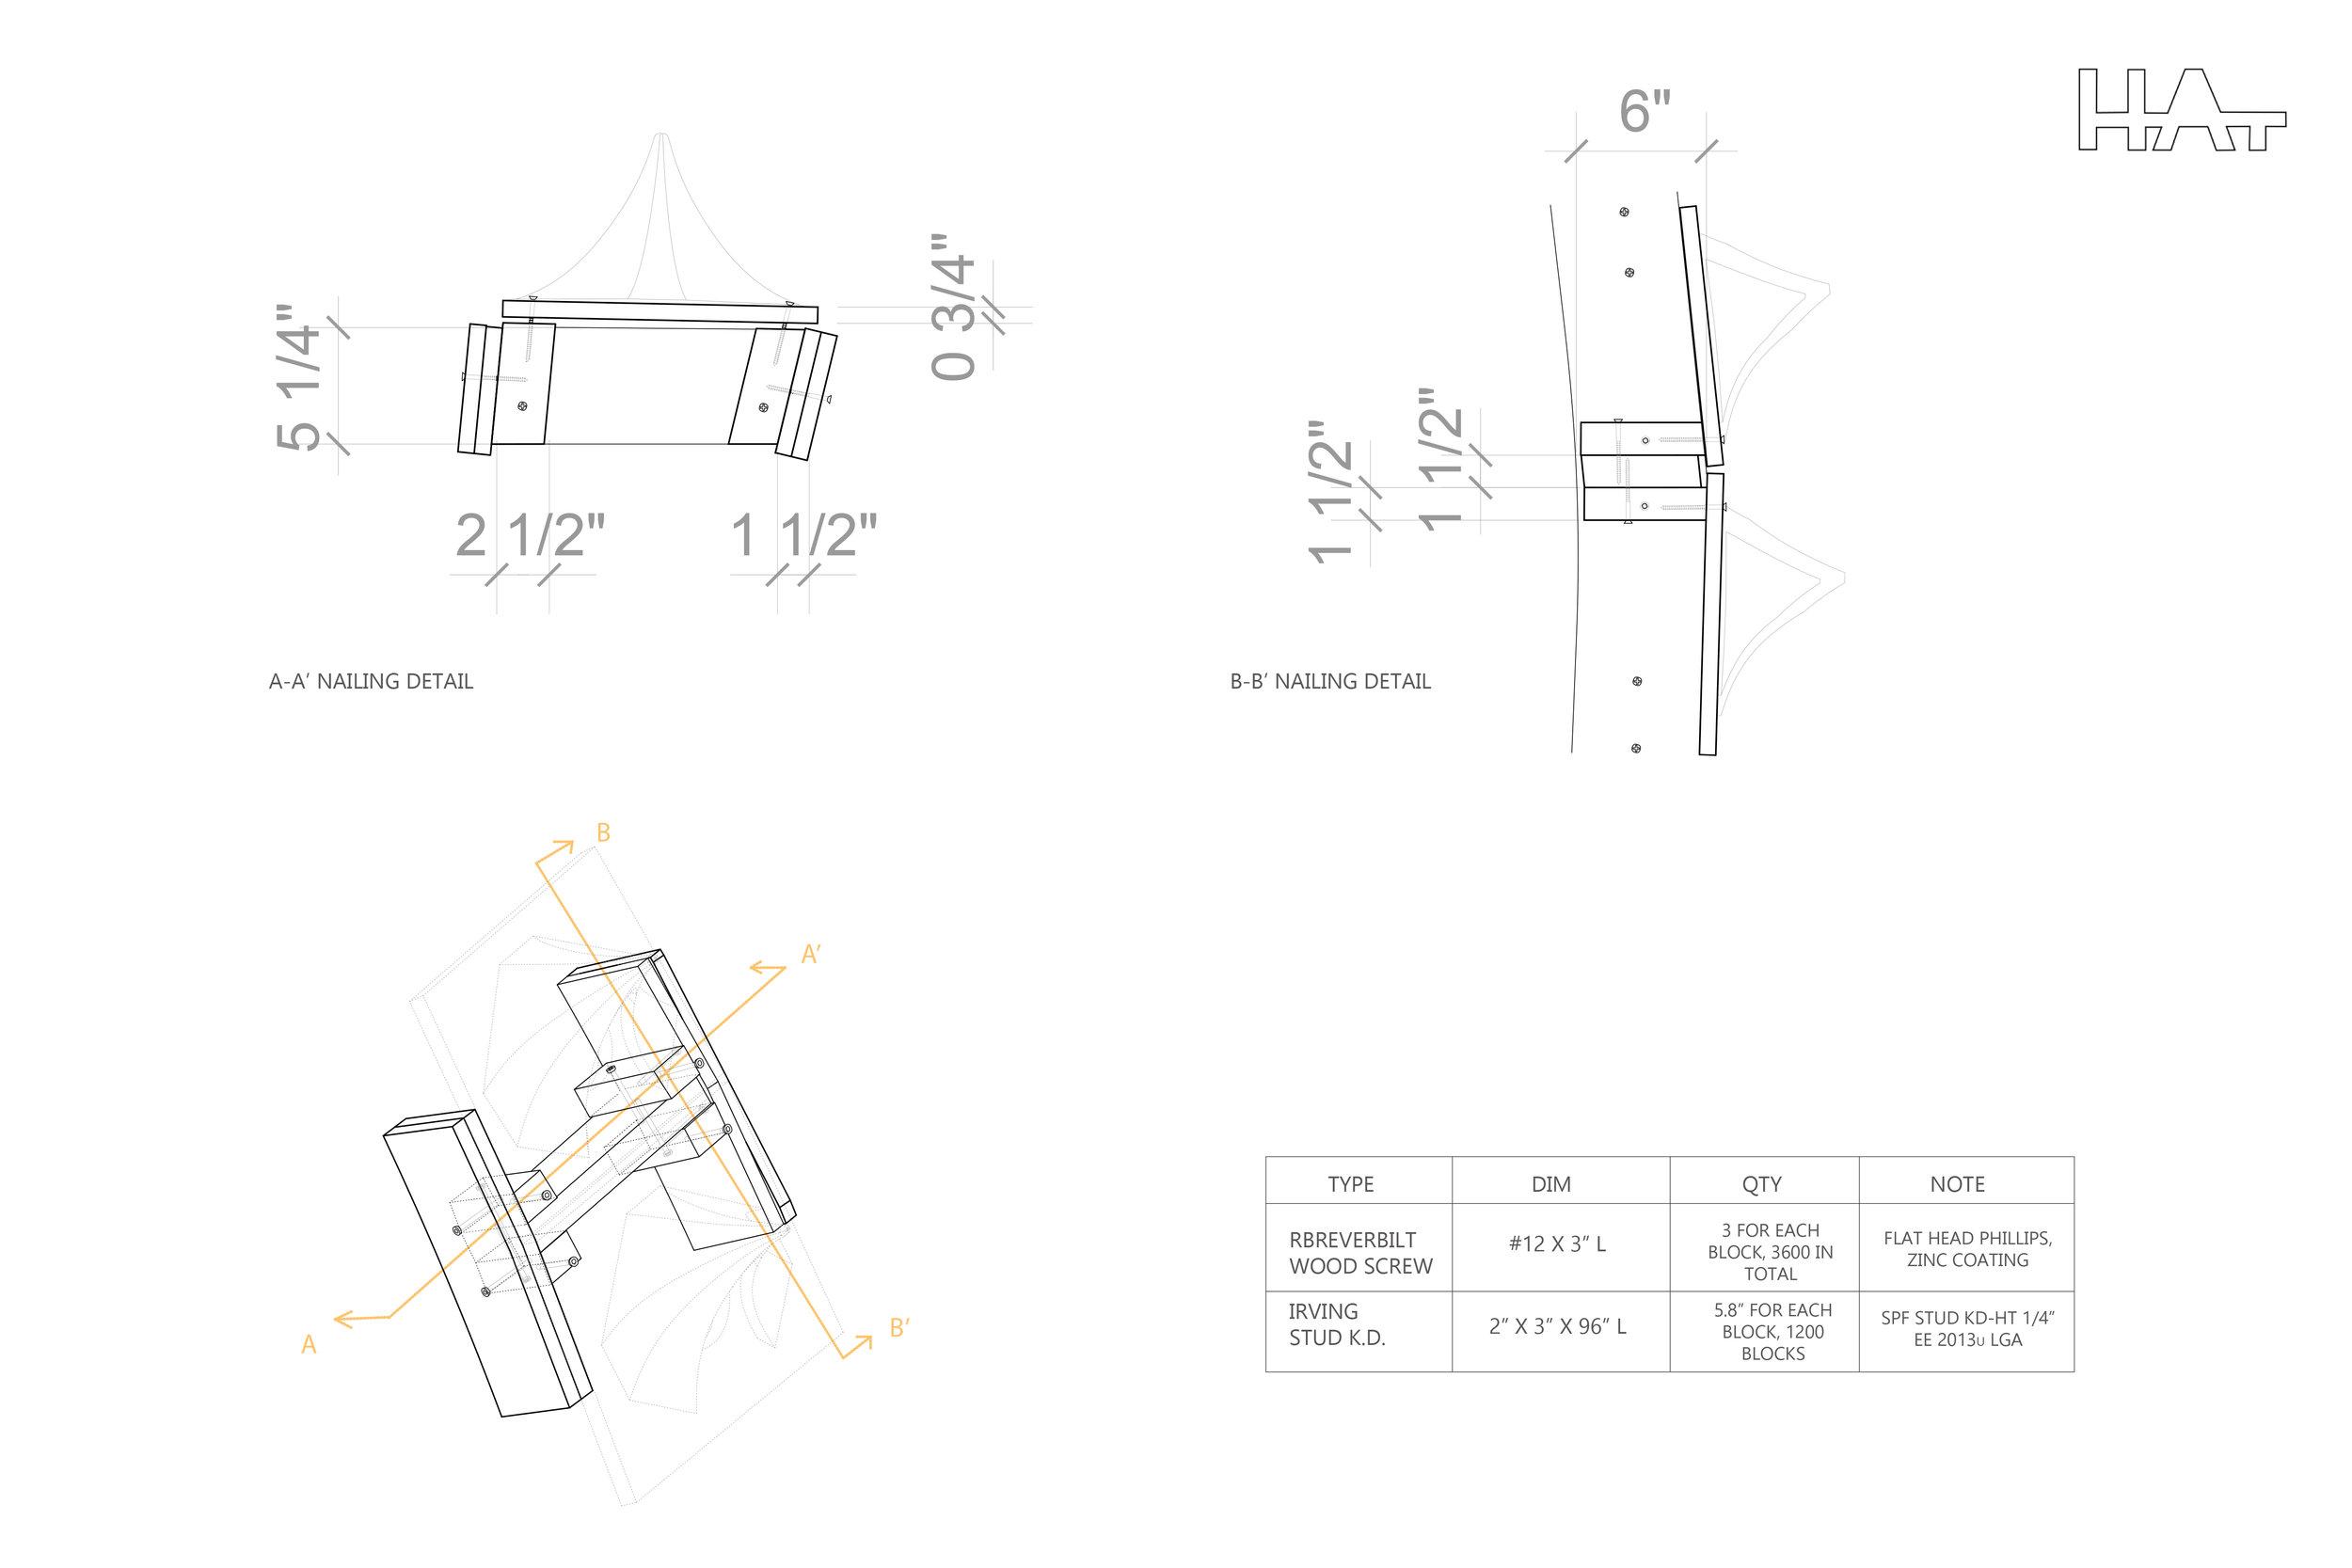 0828 Documents-2.jpg